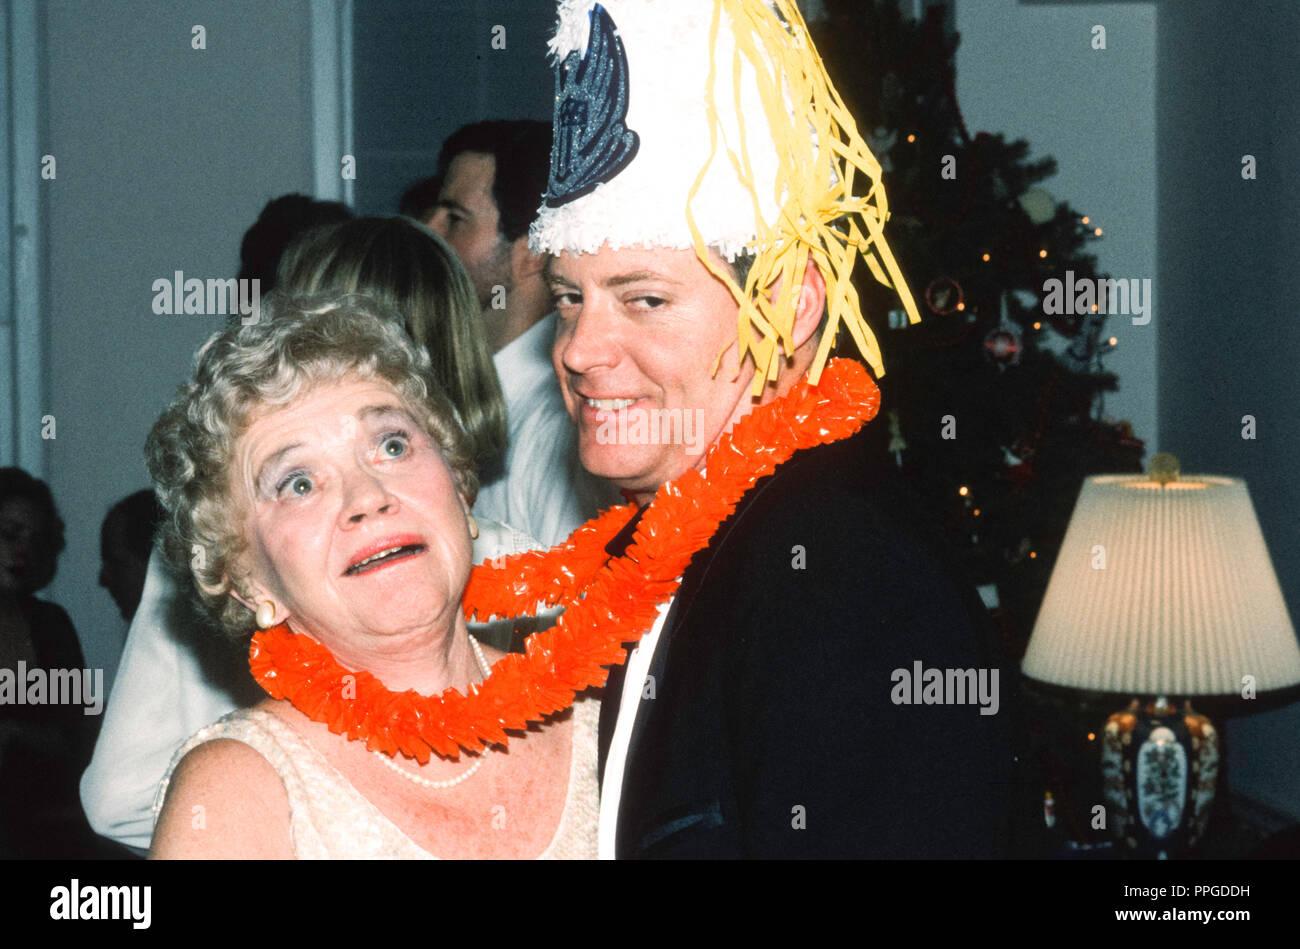 Humorous Party Scene,  Couple Dancing, 1980's, NYC, USA - Stock Image